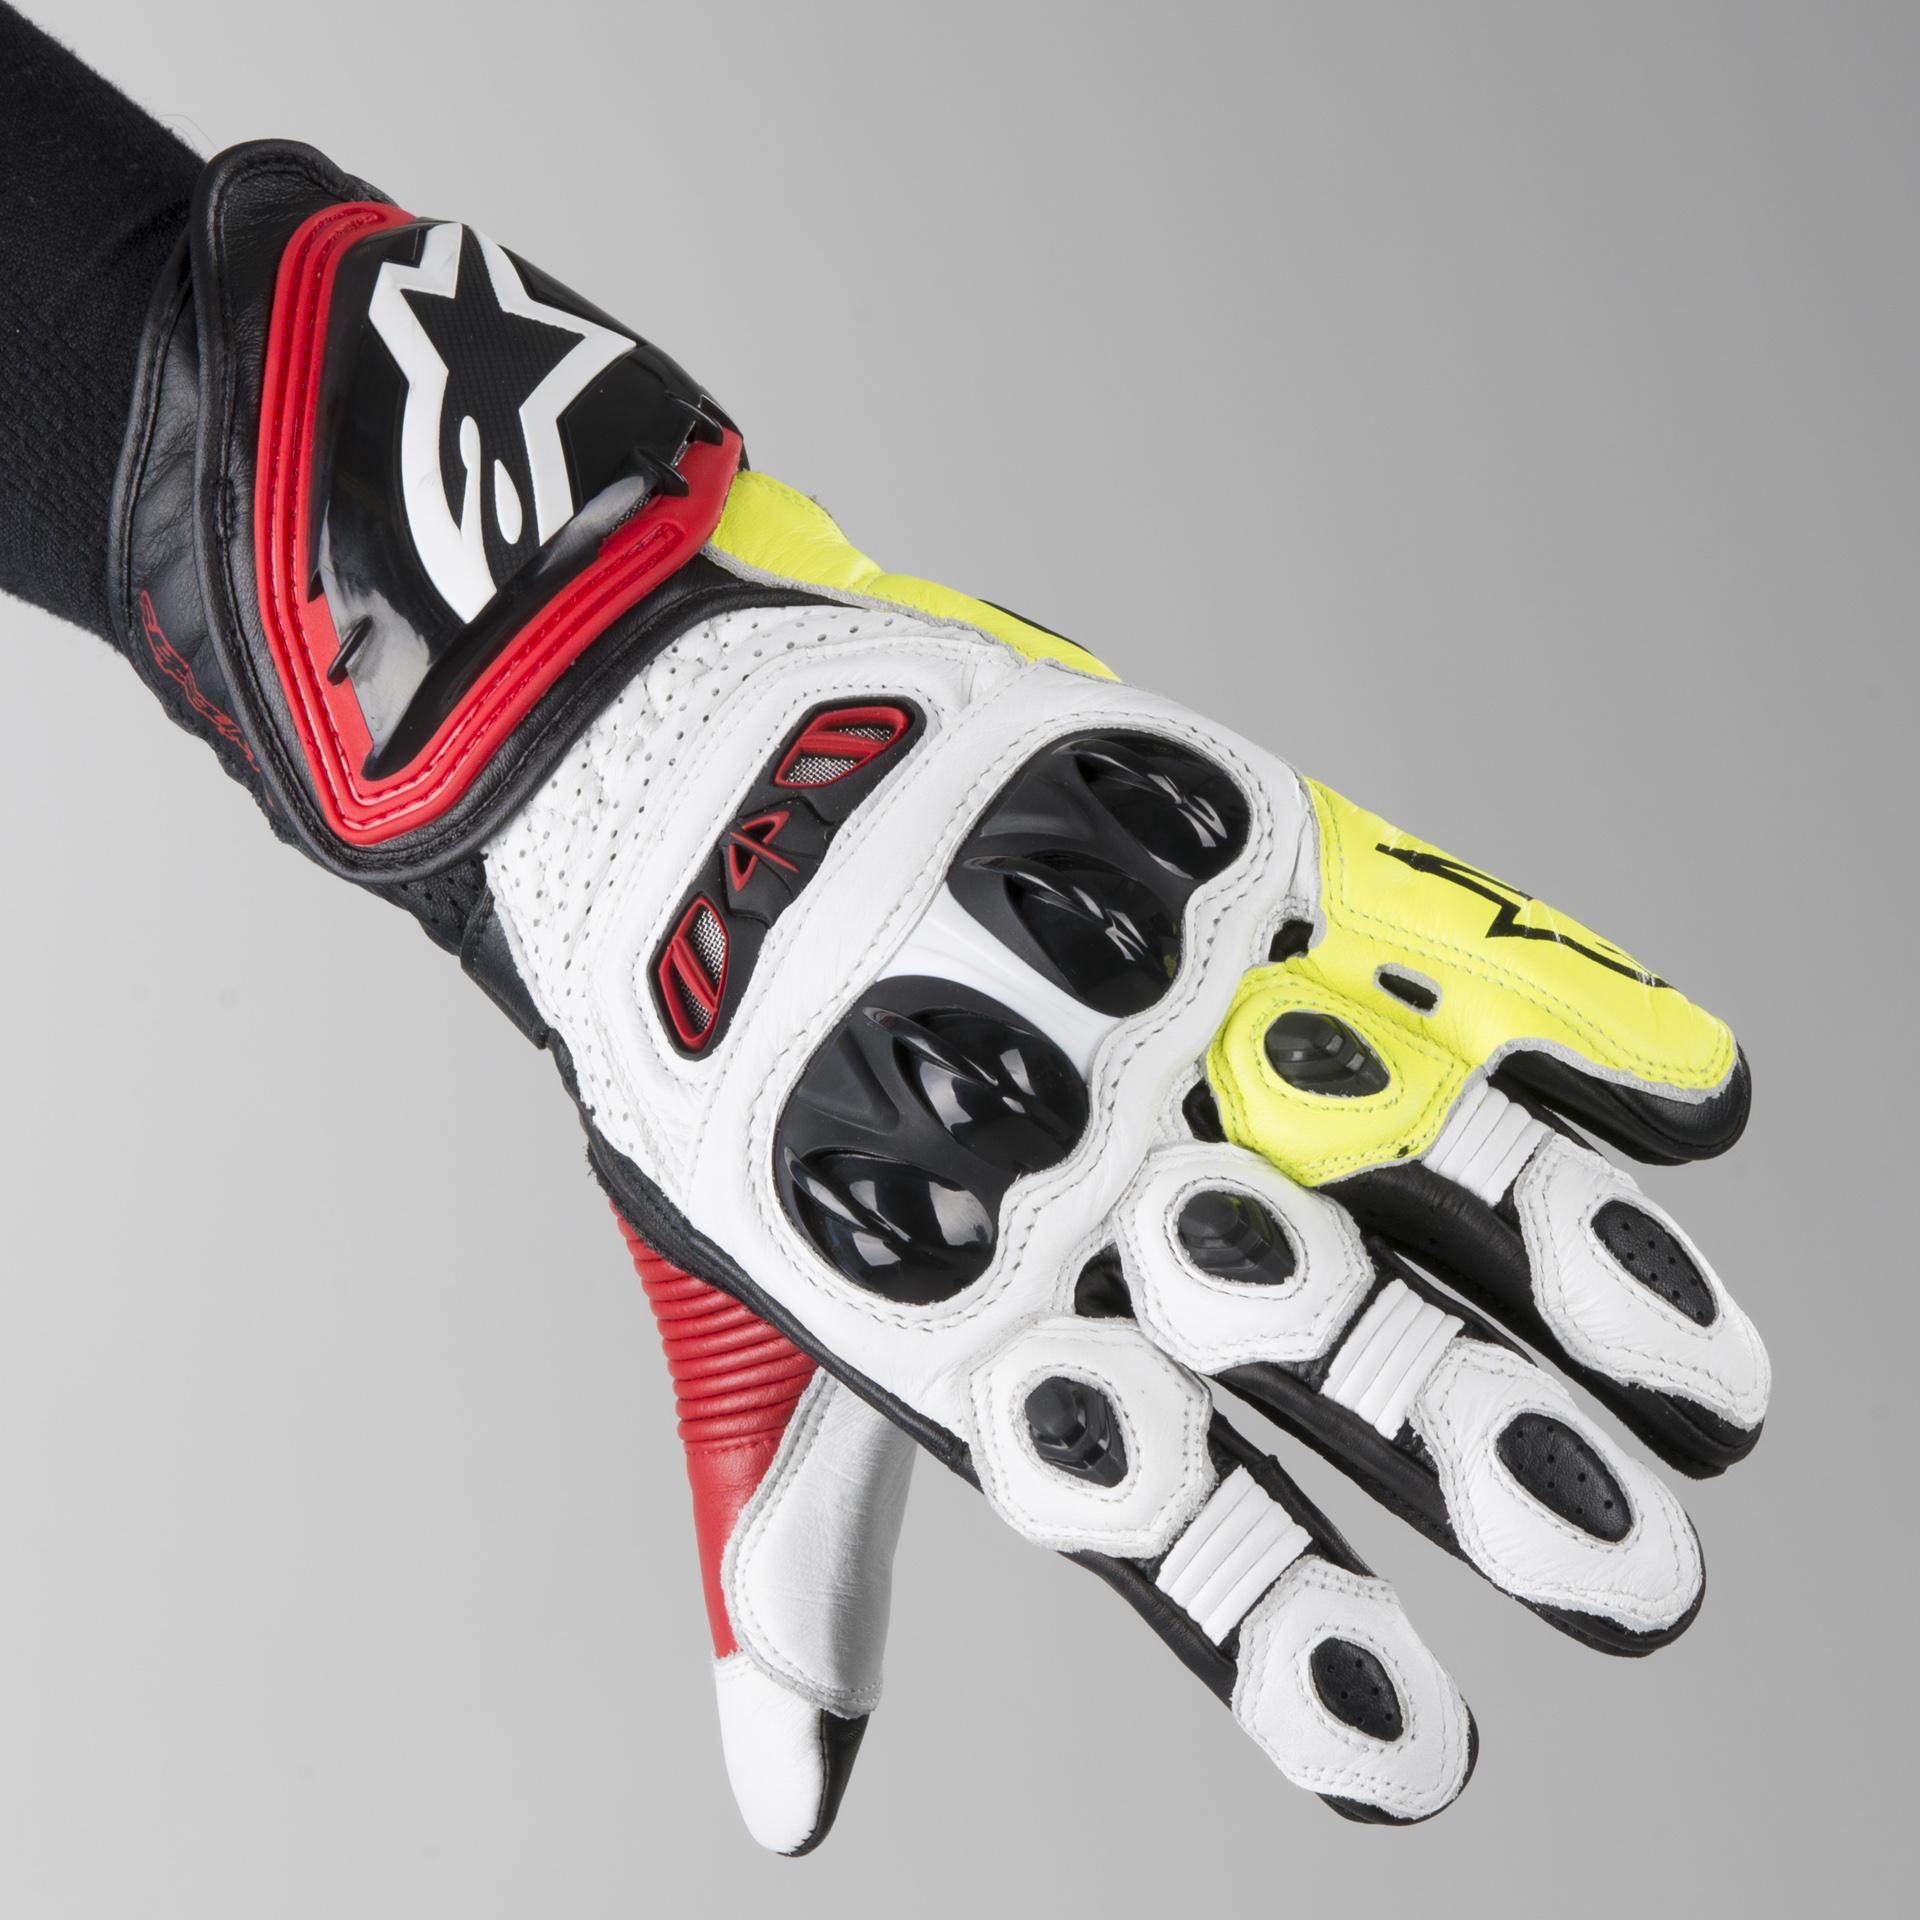 Alpinestars GP Tech Gloves Black Red Fluorescent